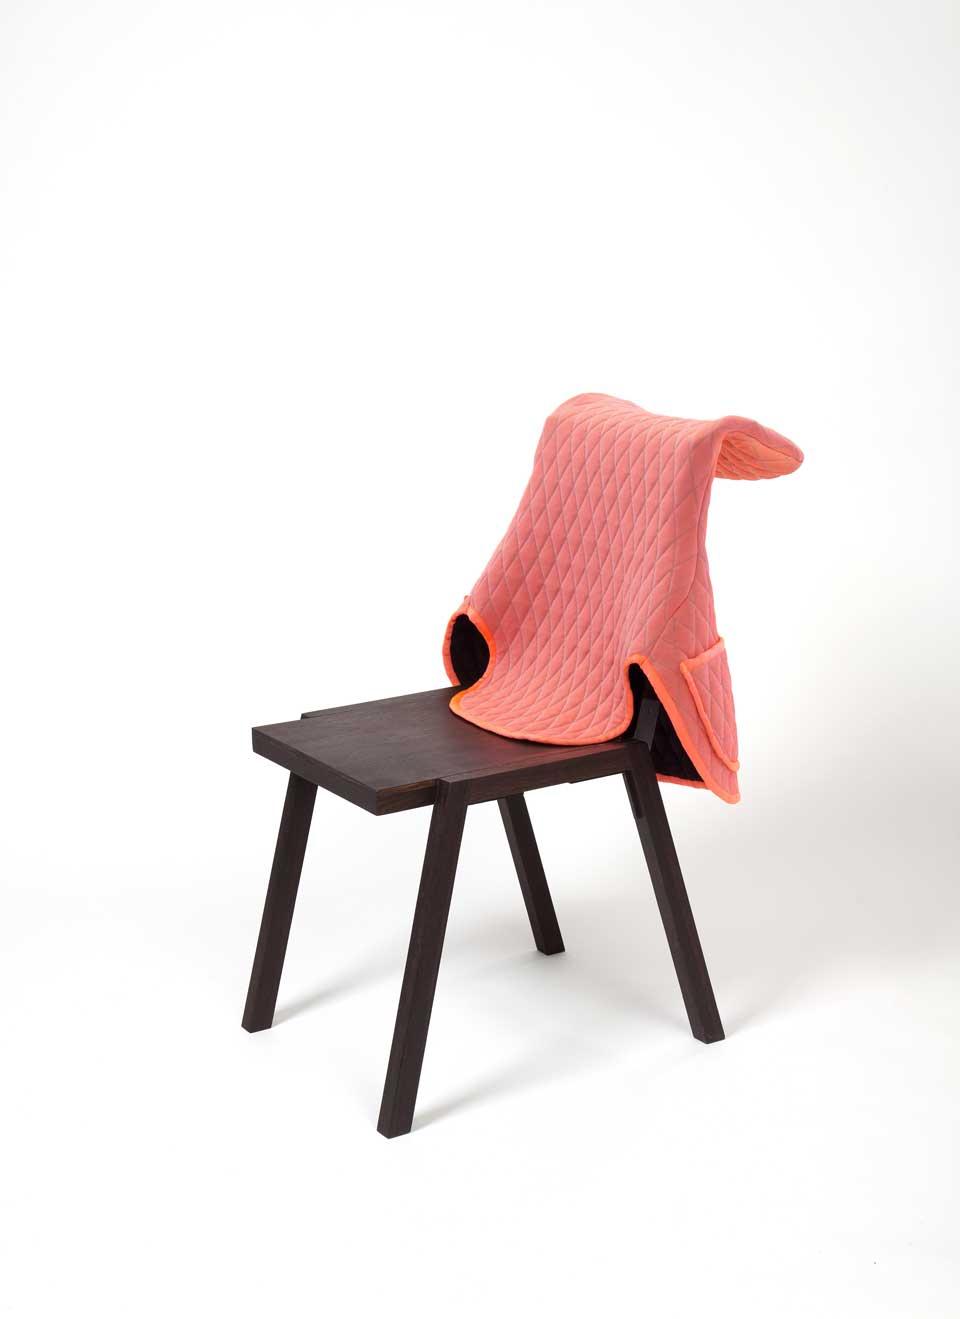 Chair Wear by Bernotat&Co